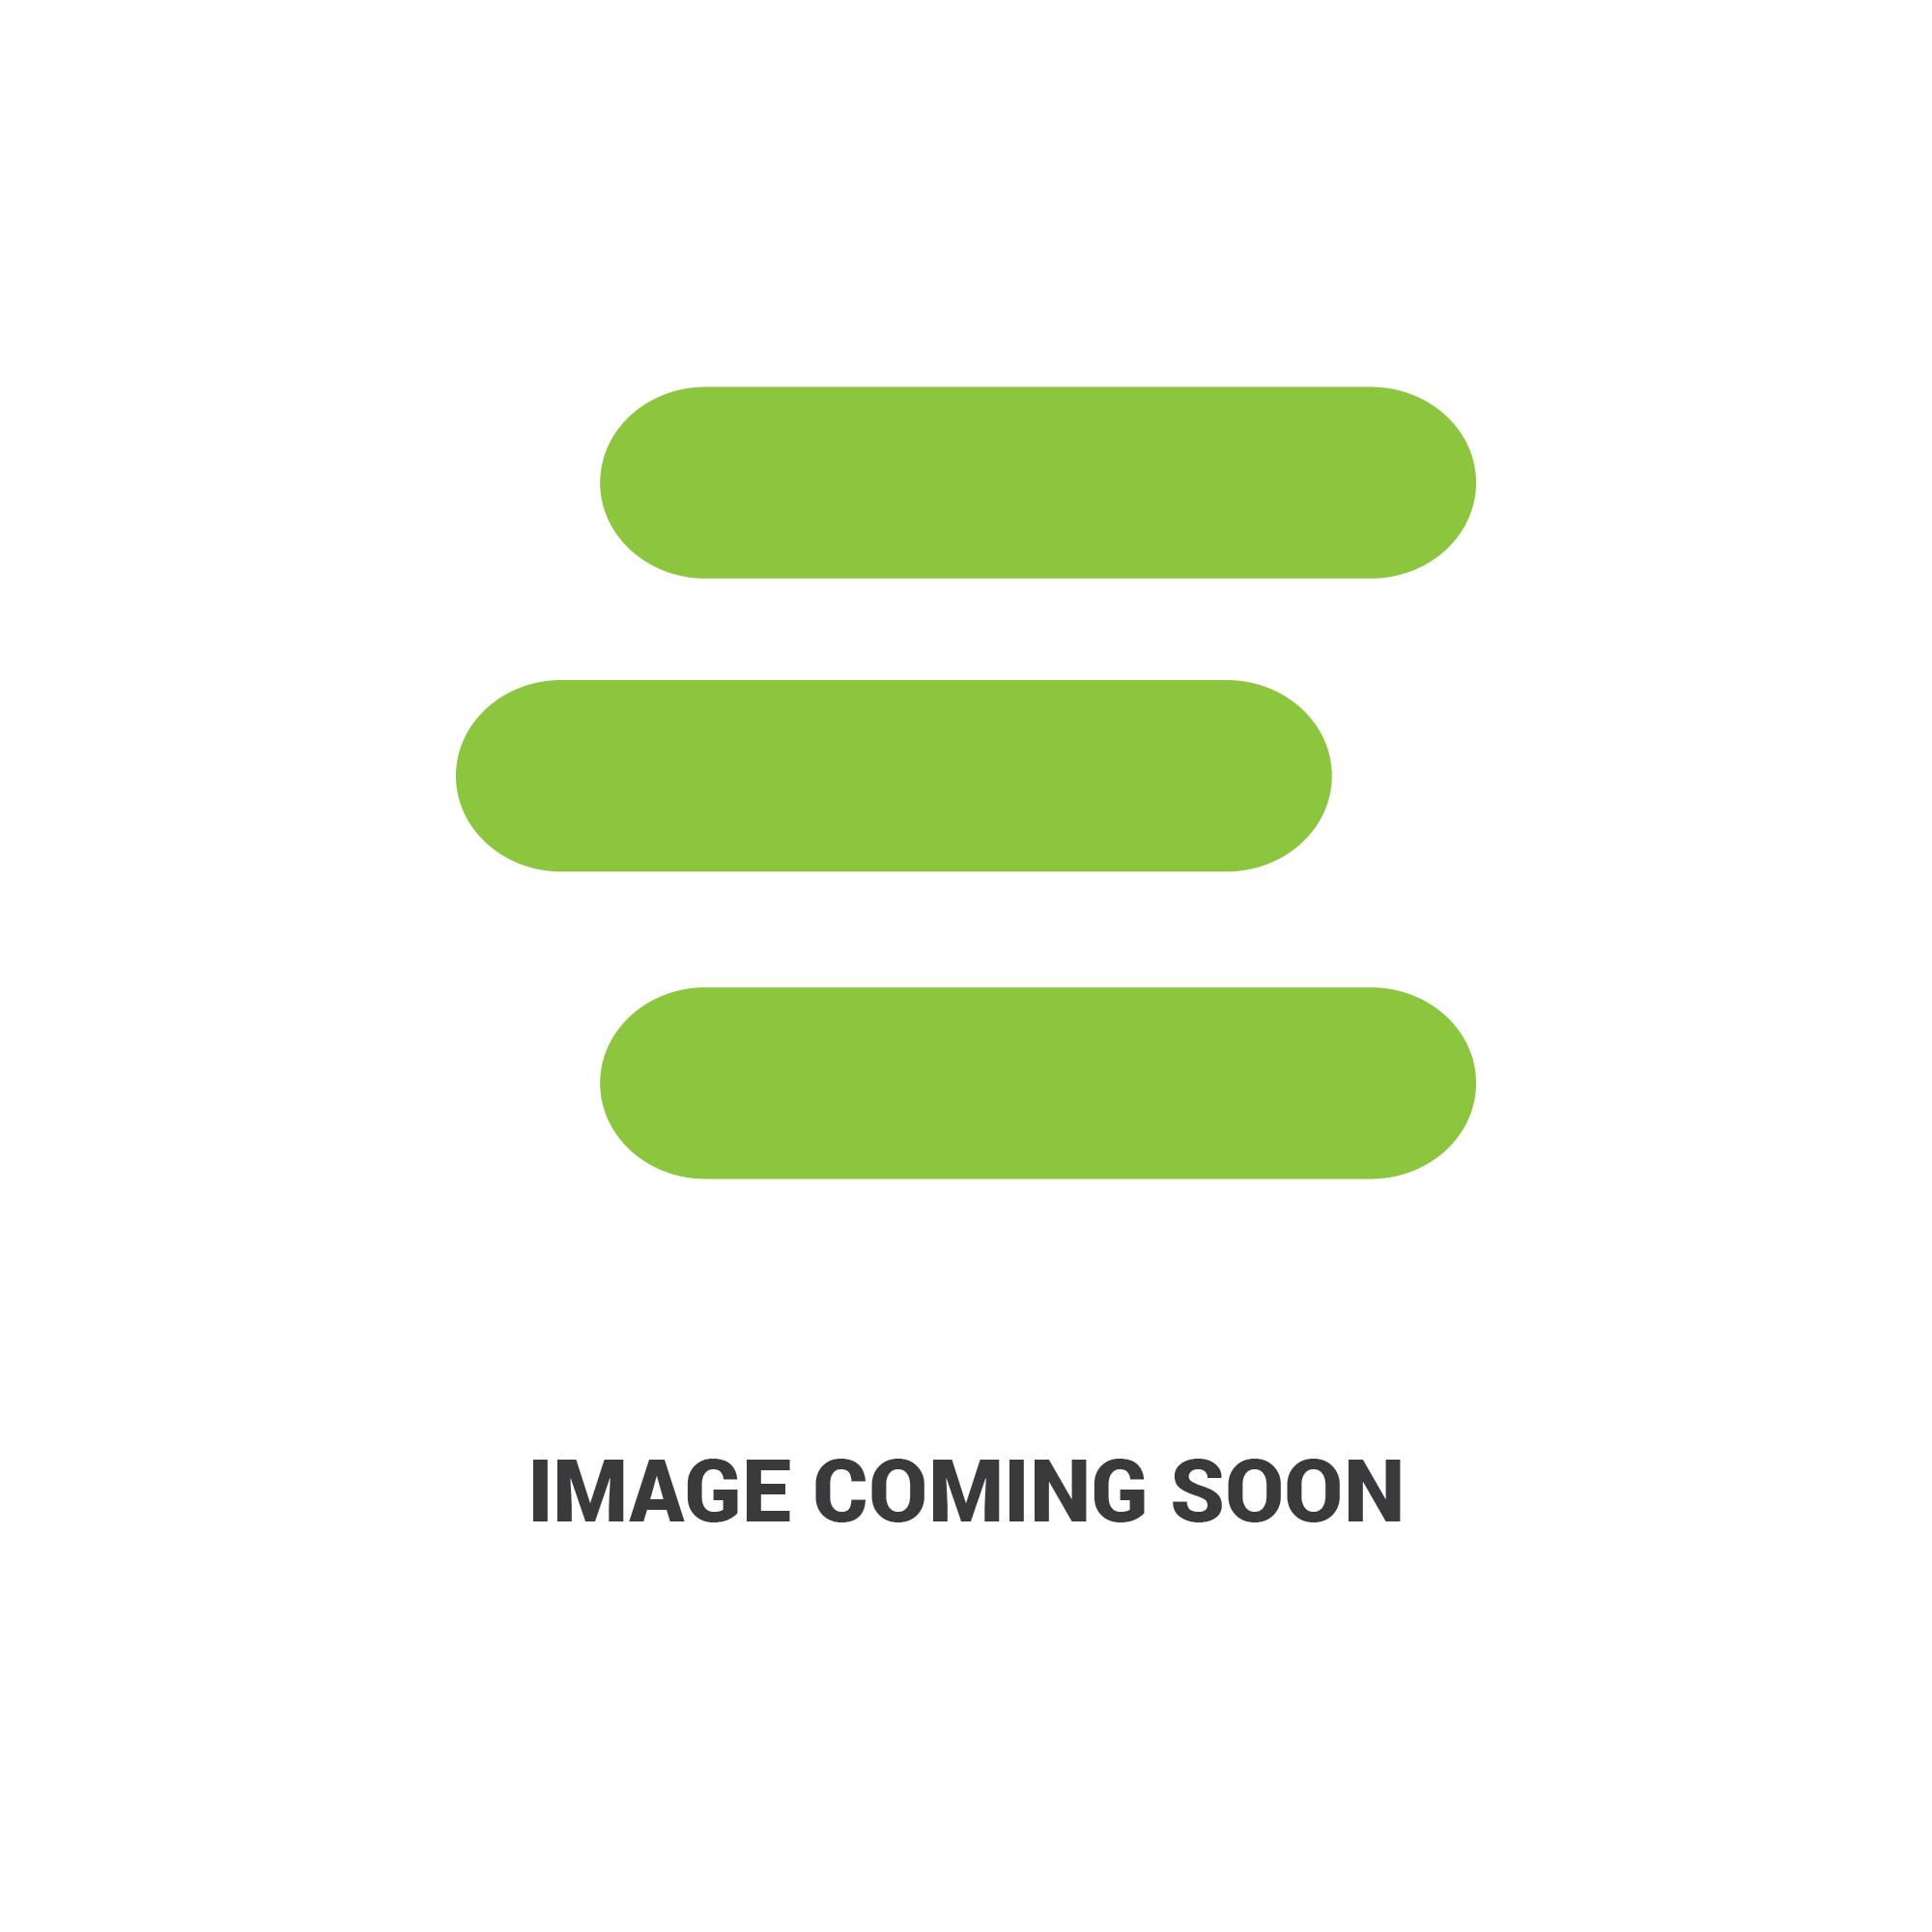 E-6C040-554431857_2.jpg